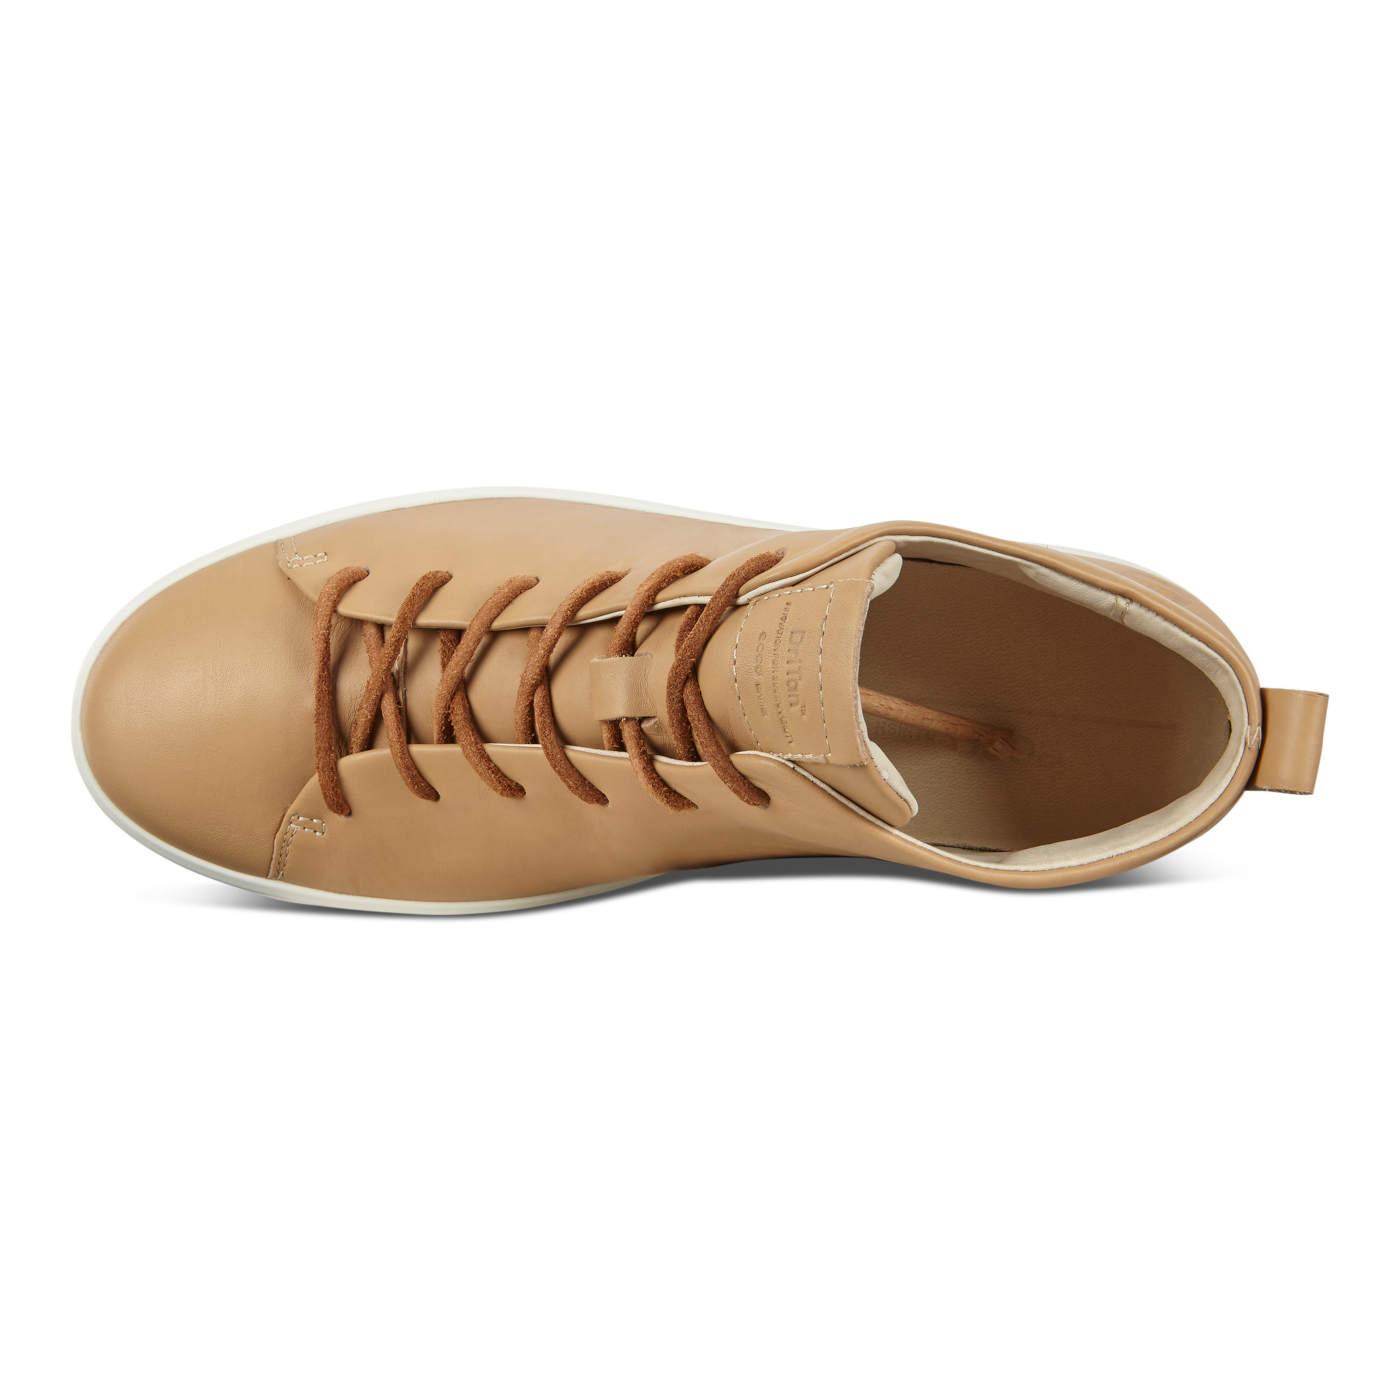 ECCO SOFT8 Womens DriTan Mid Cut Sneaker Tie